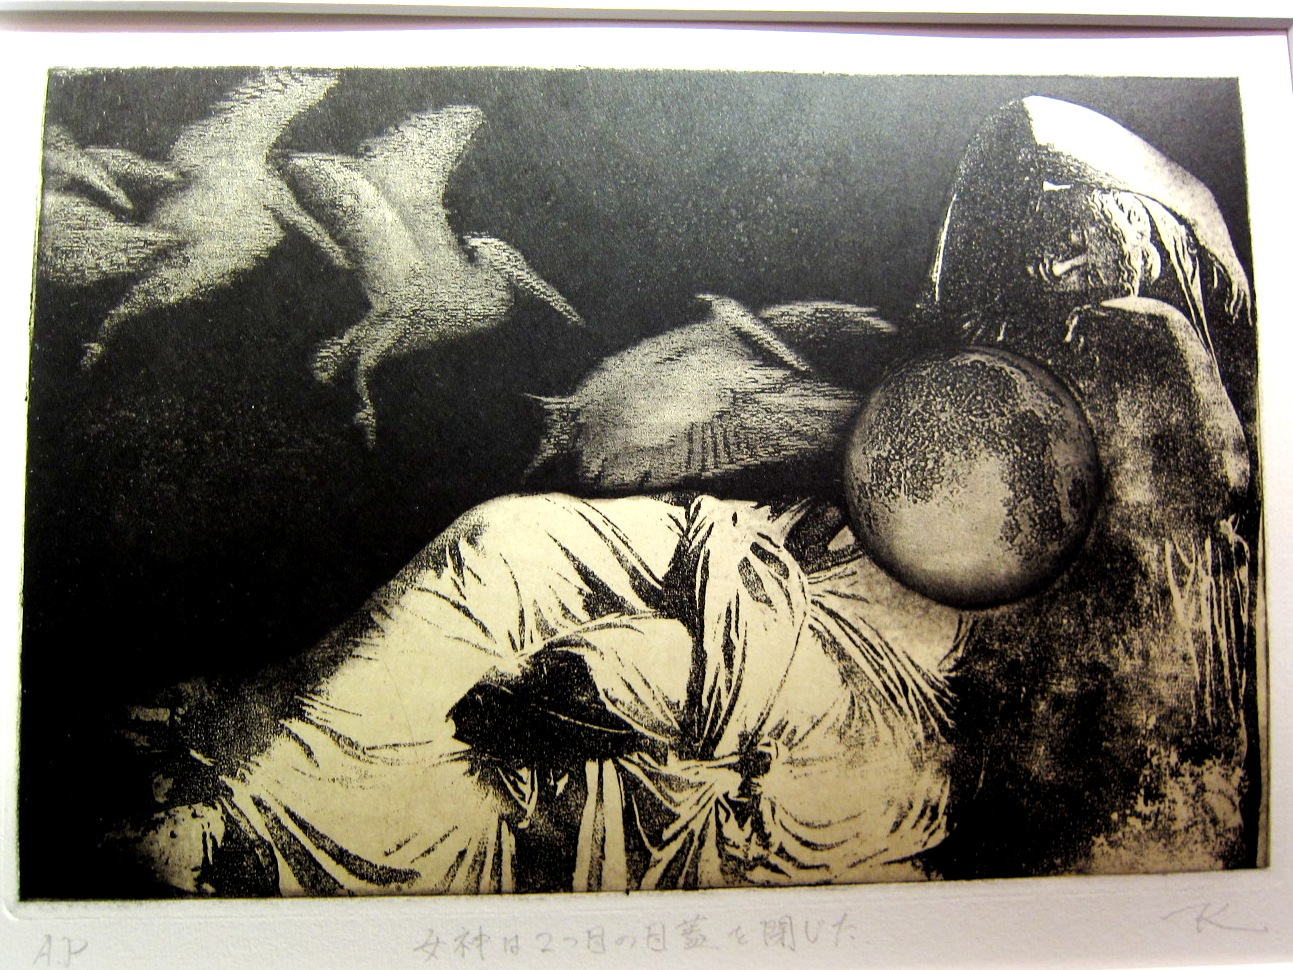 2296) 「川口巧海個展 『夜の詩学』」 g.犬養・お風呂 10月23日(水)~11月11日(月)  _f0126829_1554765.jpg